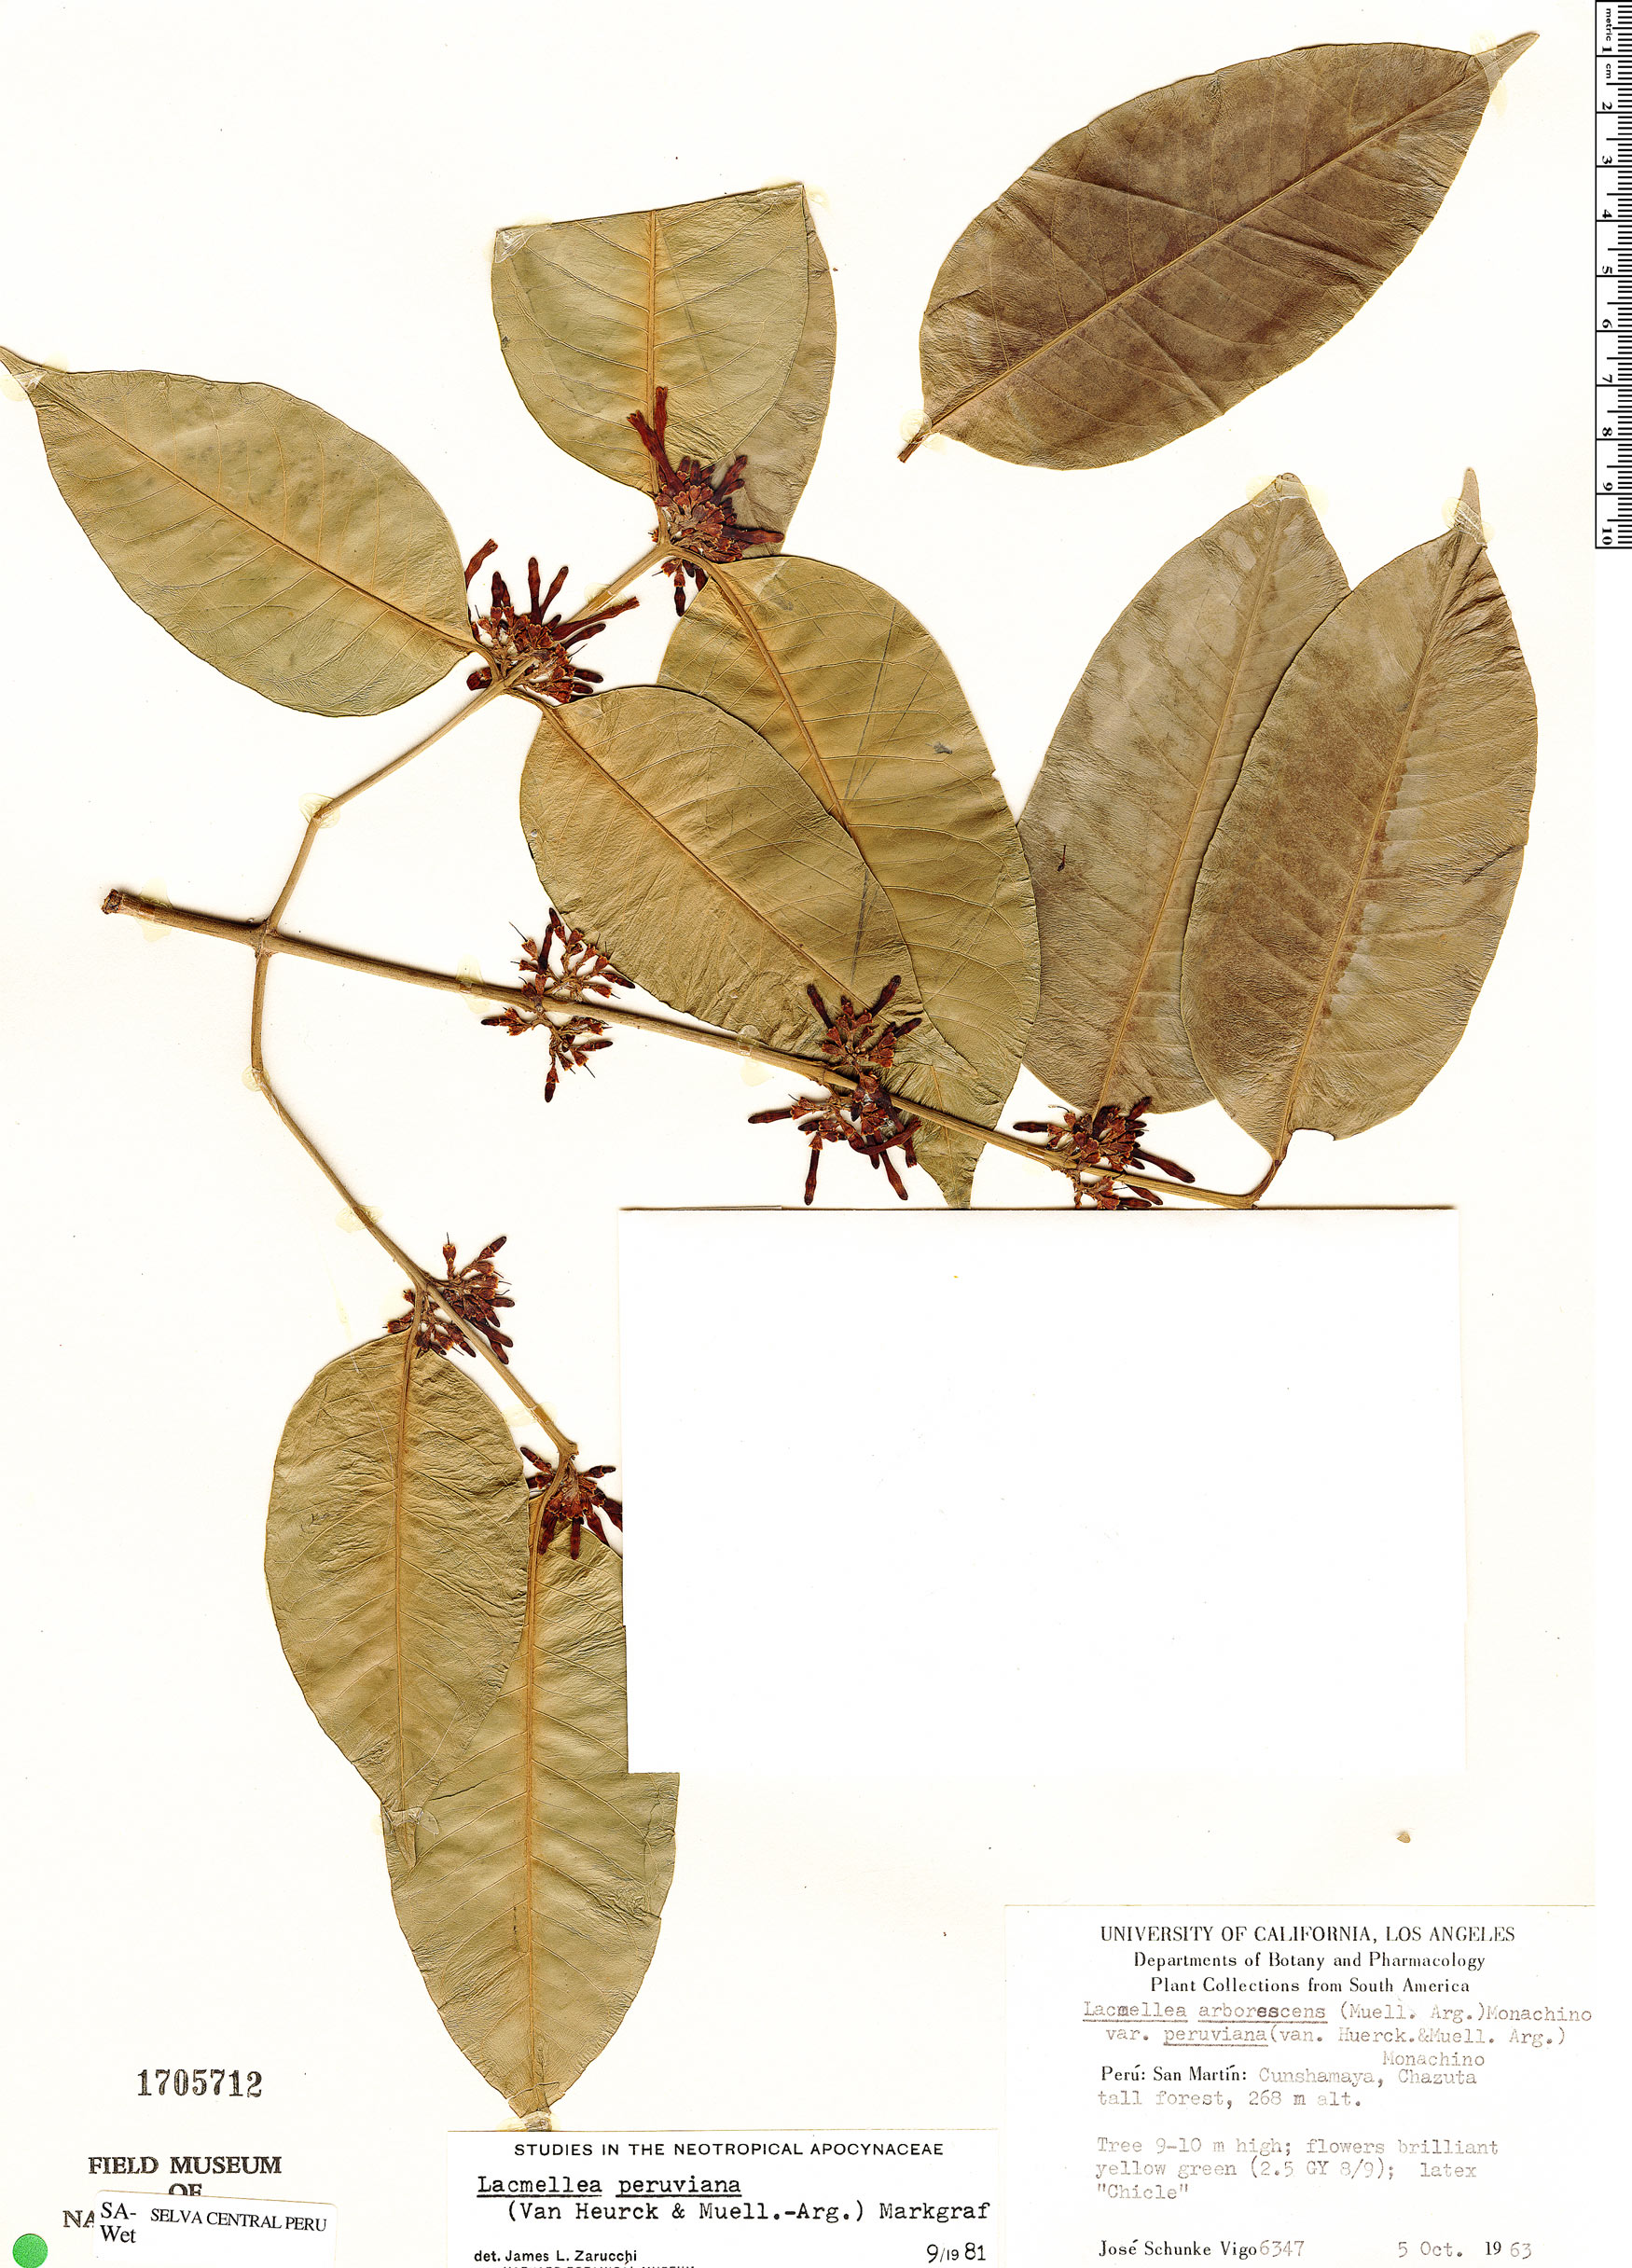 Specimen: Lacmellea peruviana